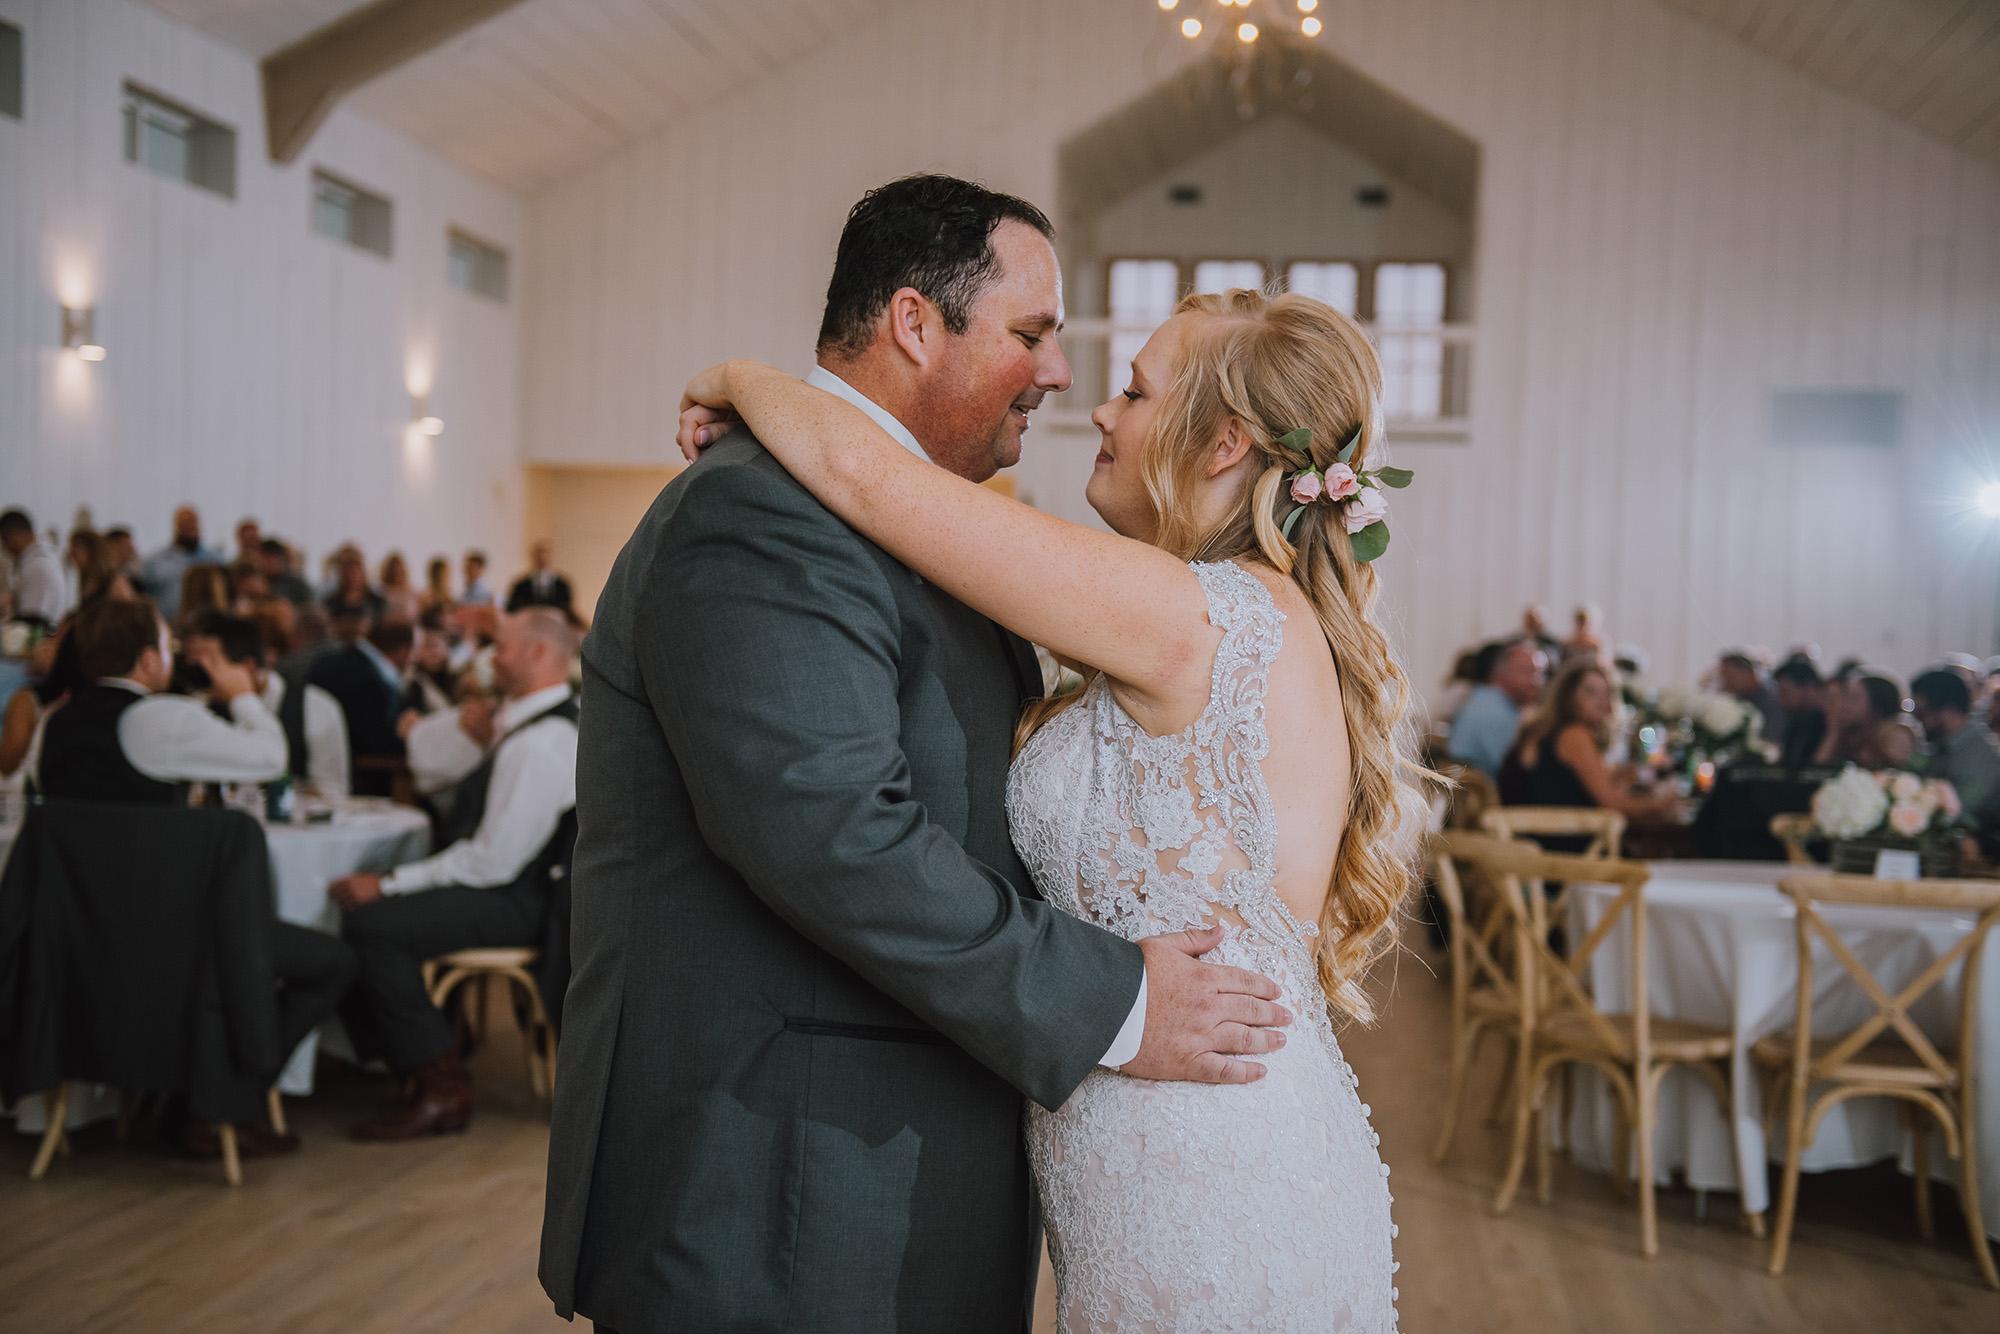 Gorgeous Wedding Photos - The Grand Ivory Wedding - Leonard, Texas Wedding Venue